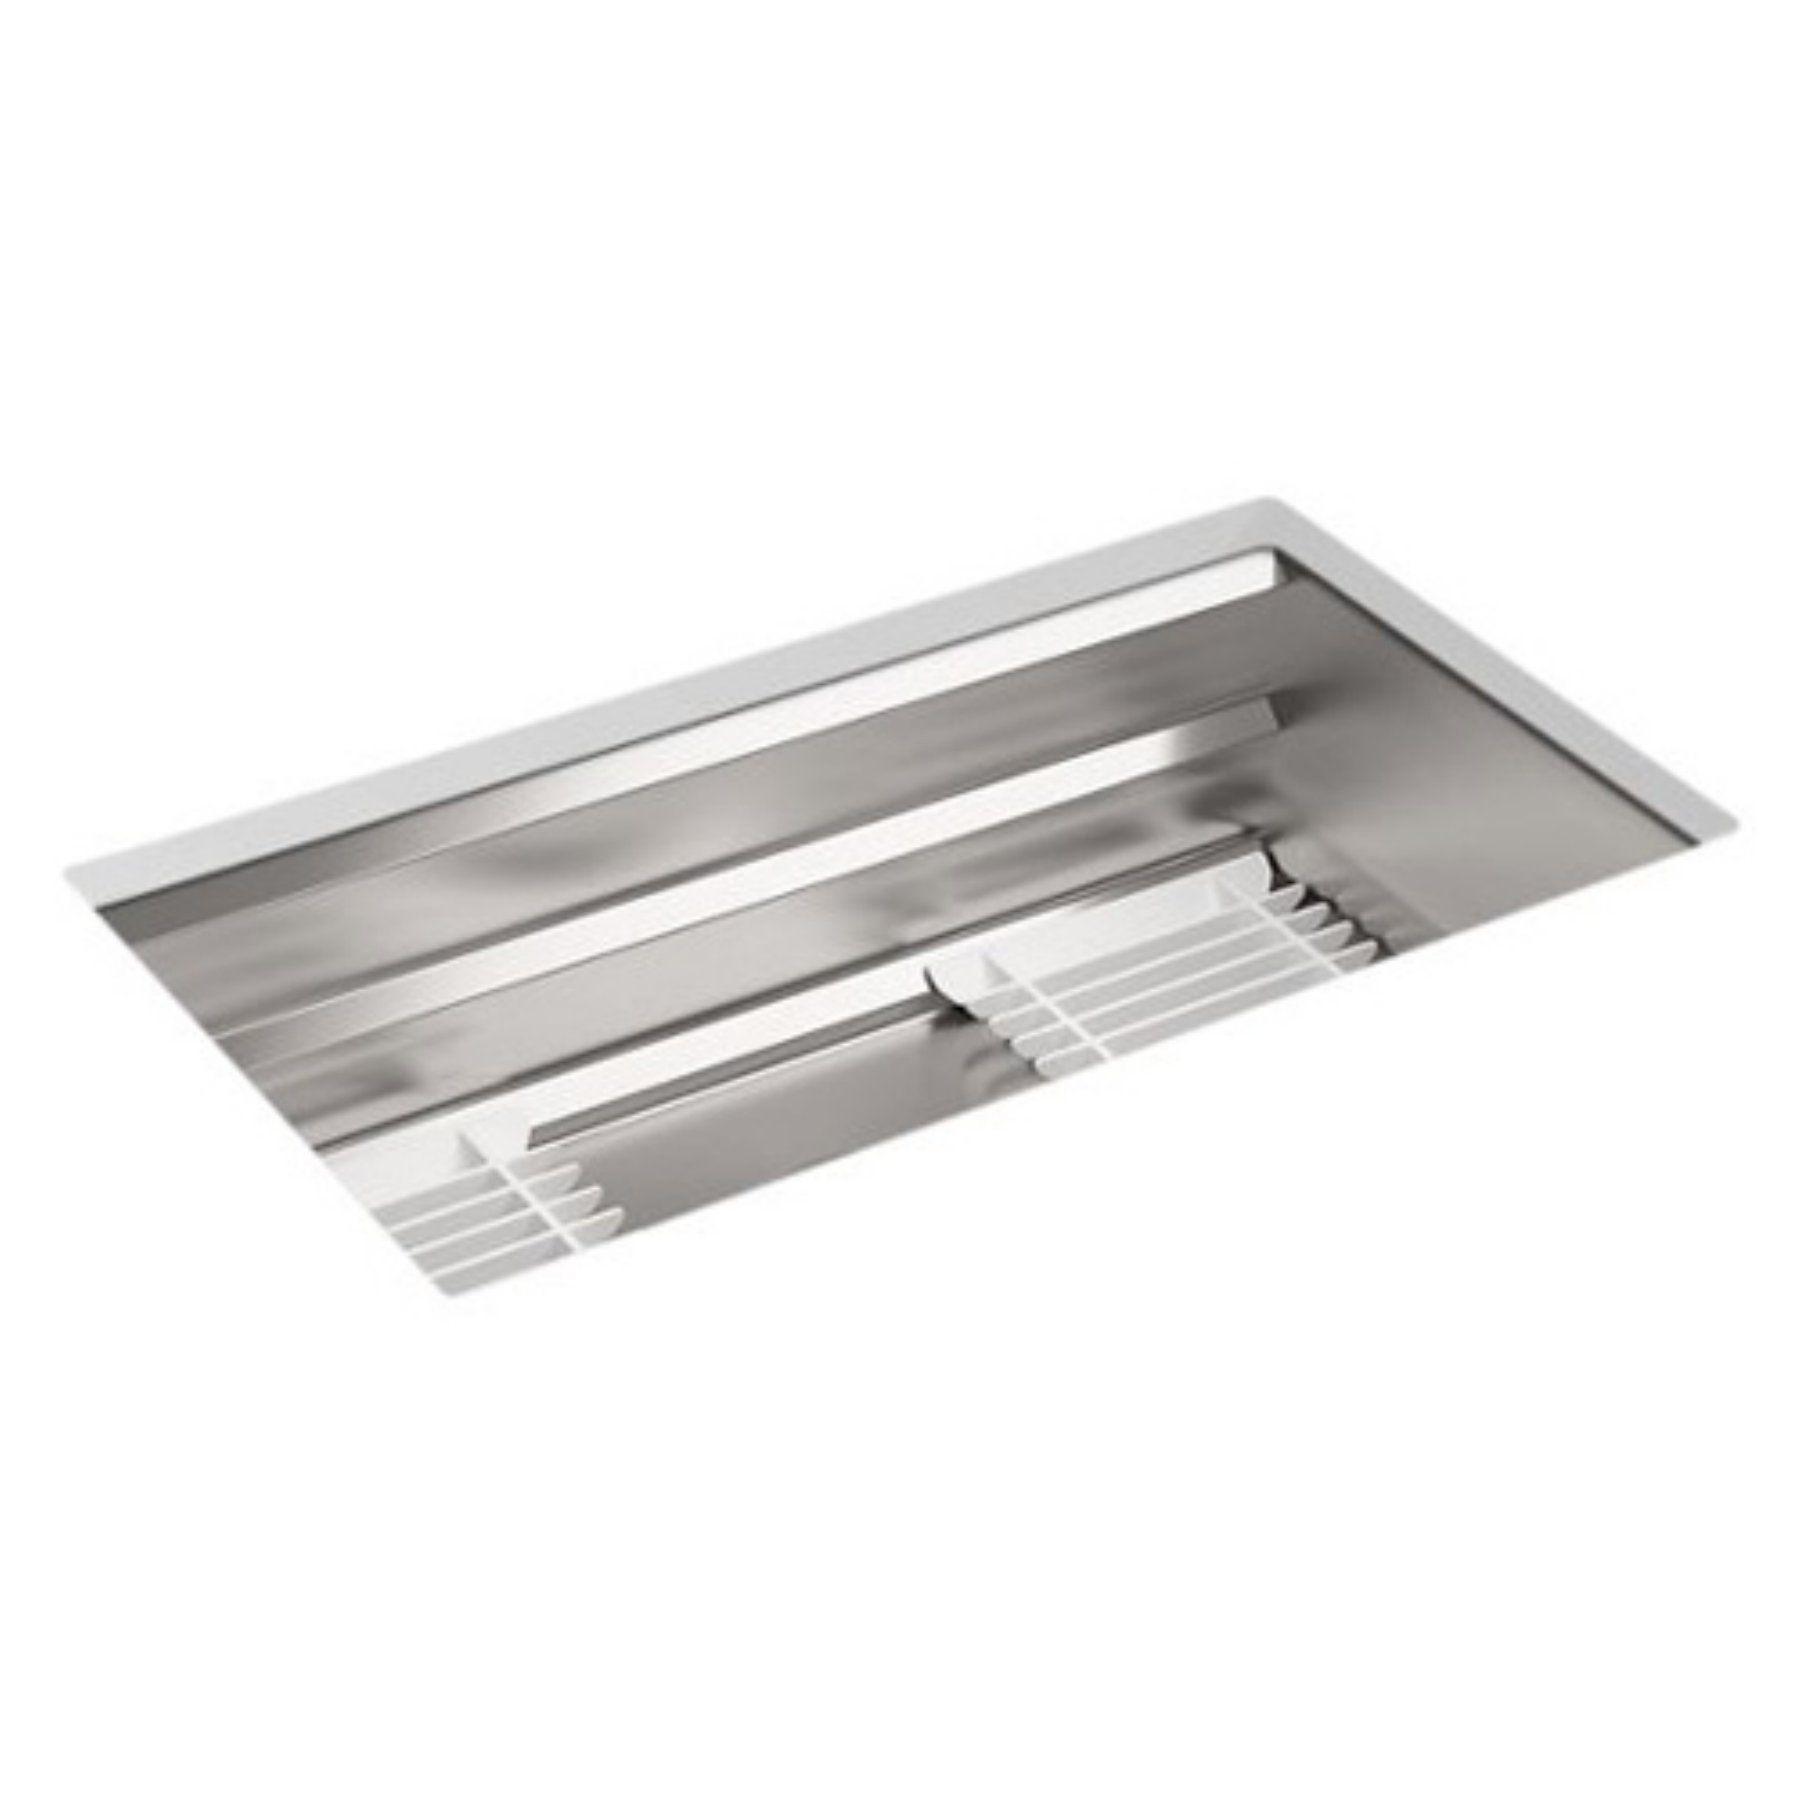 Kohler prolific single basin undermount kitchen sink with